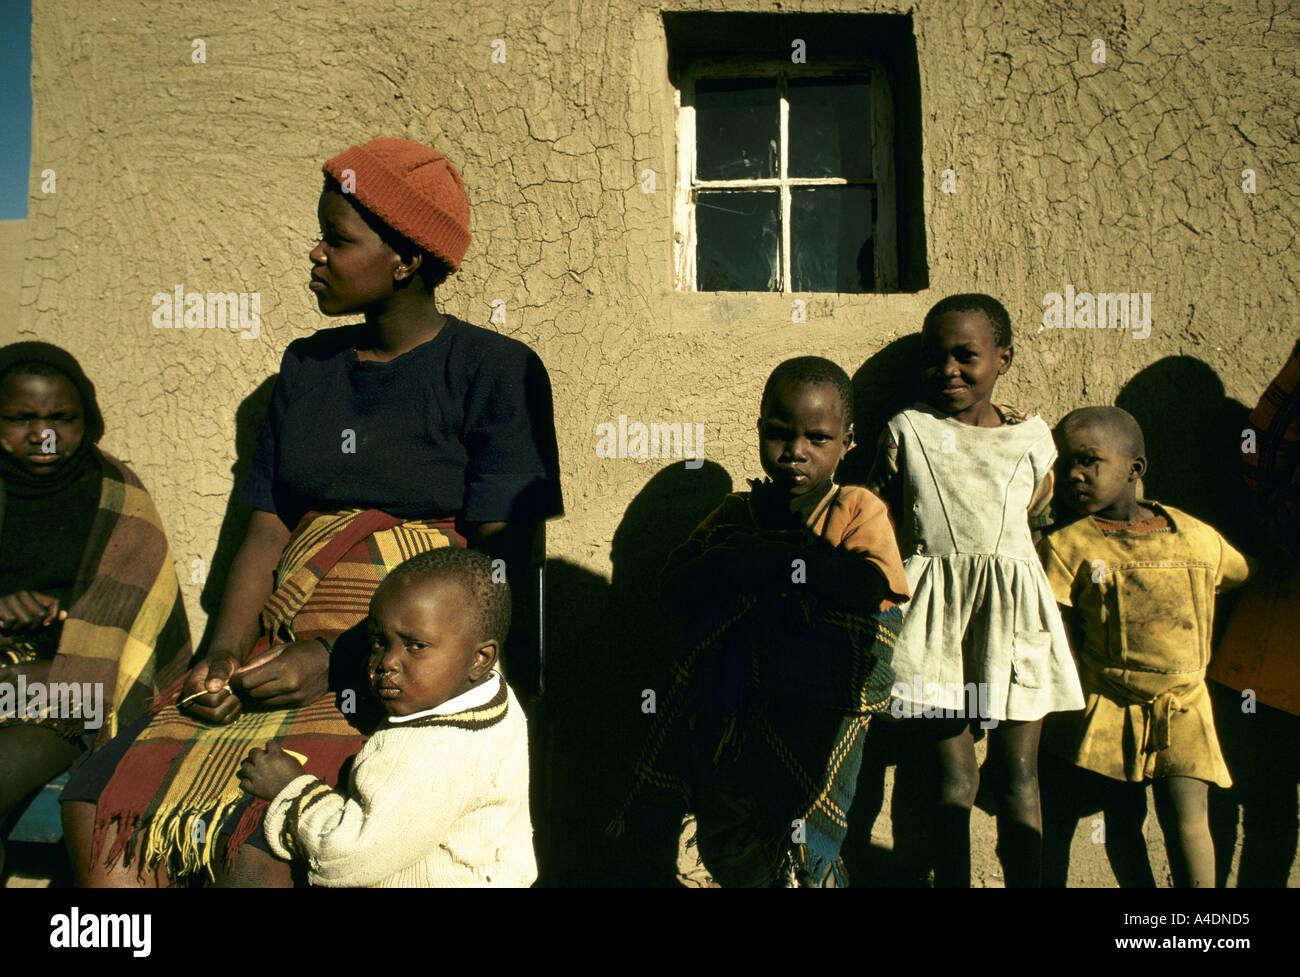 Qwa Qwa homeland, South Africa - Stock Image